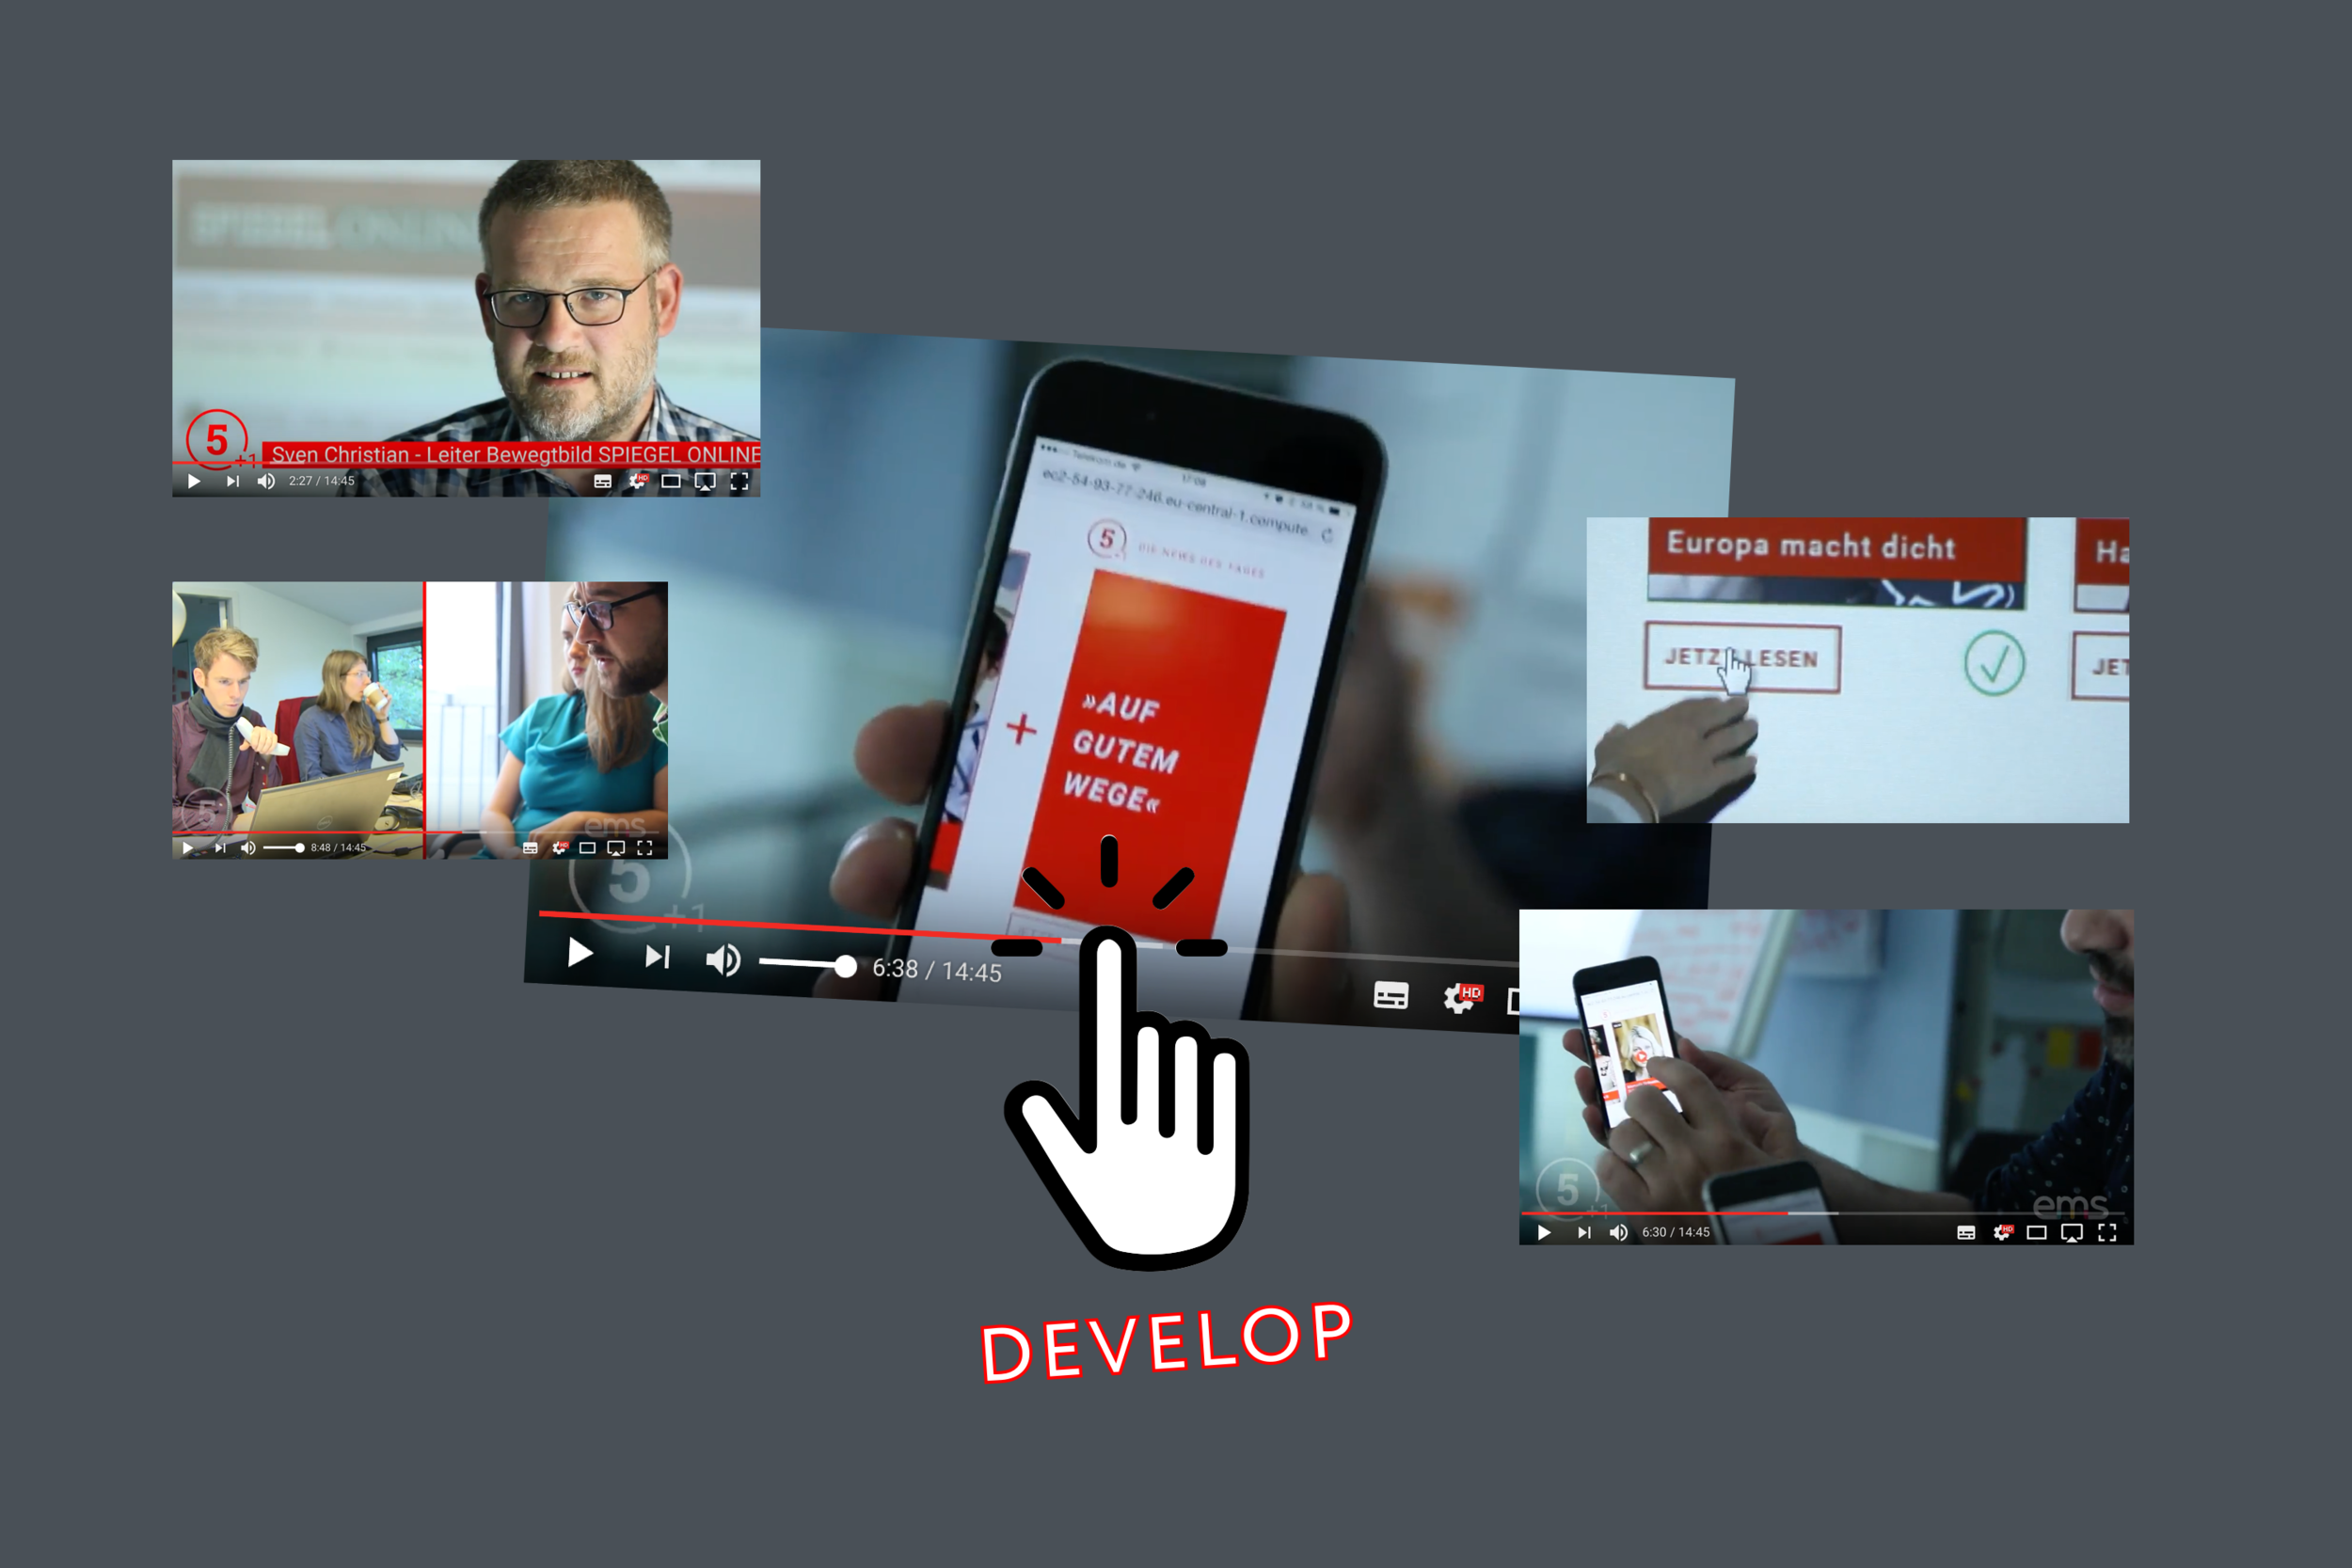 5pluseins_process_develop